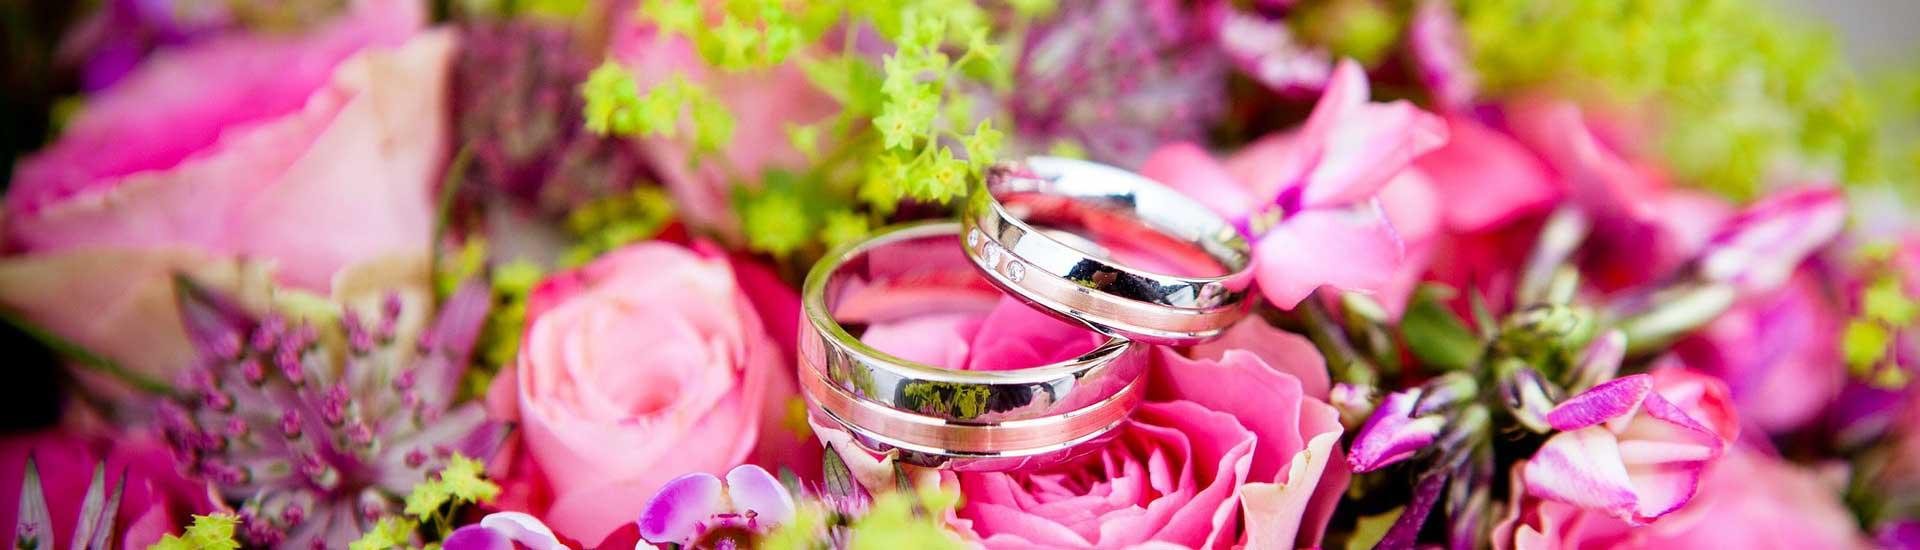 comment bien planifier son mariage wedding planner mariage en suisse. Black Bedroom Furniture Sets. Home Design Ideas